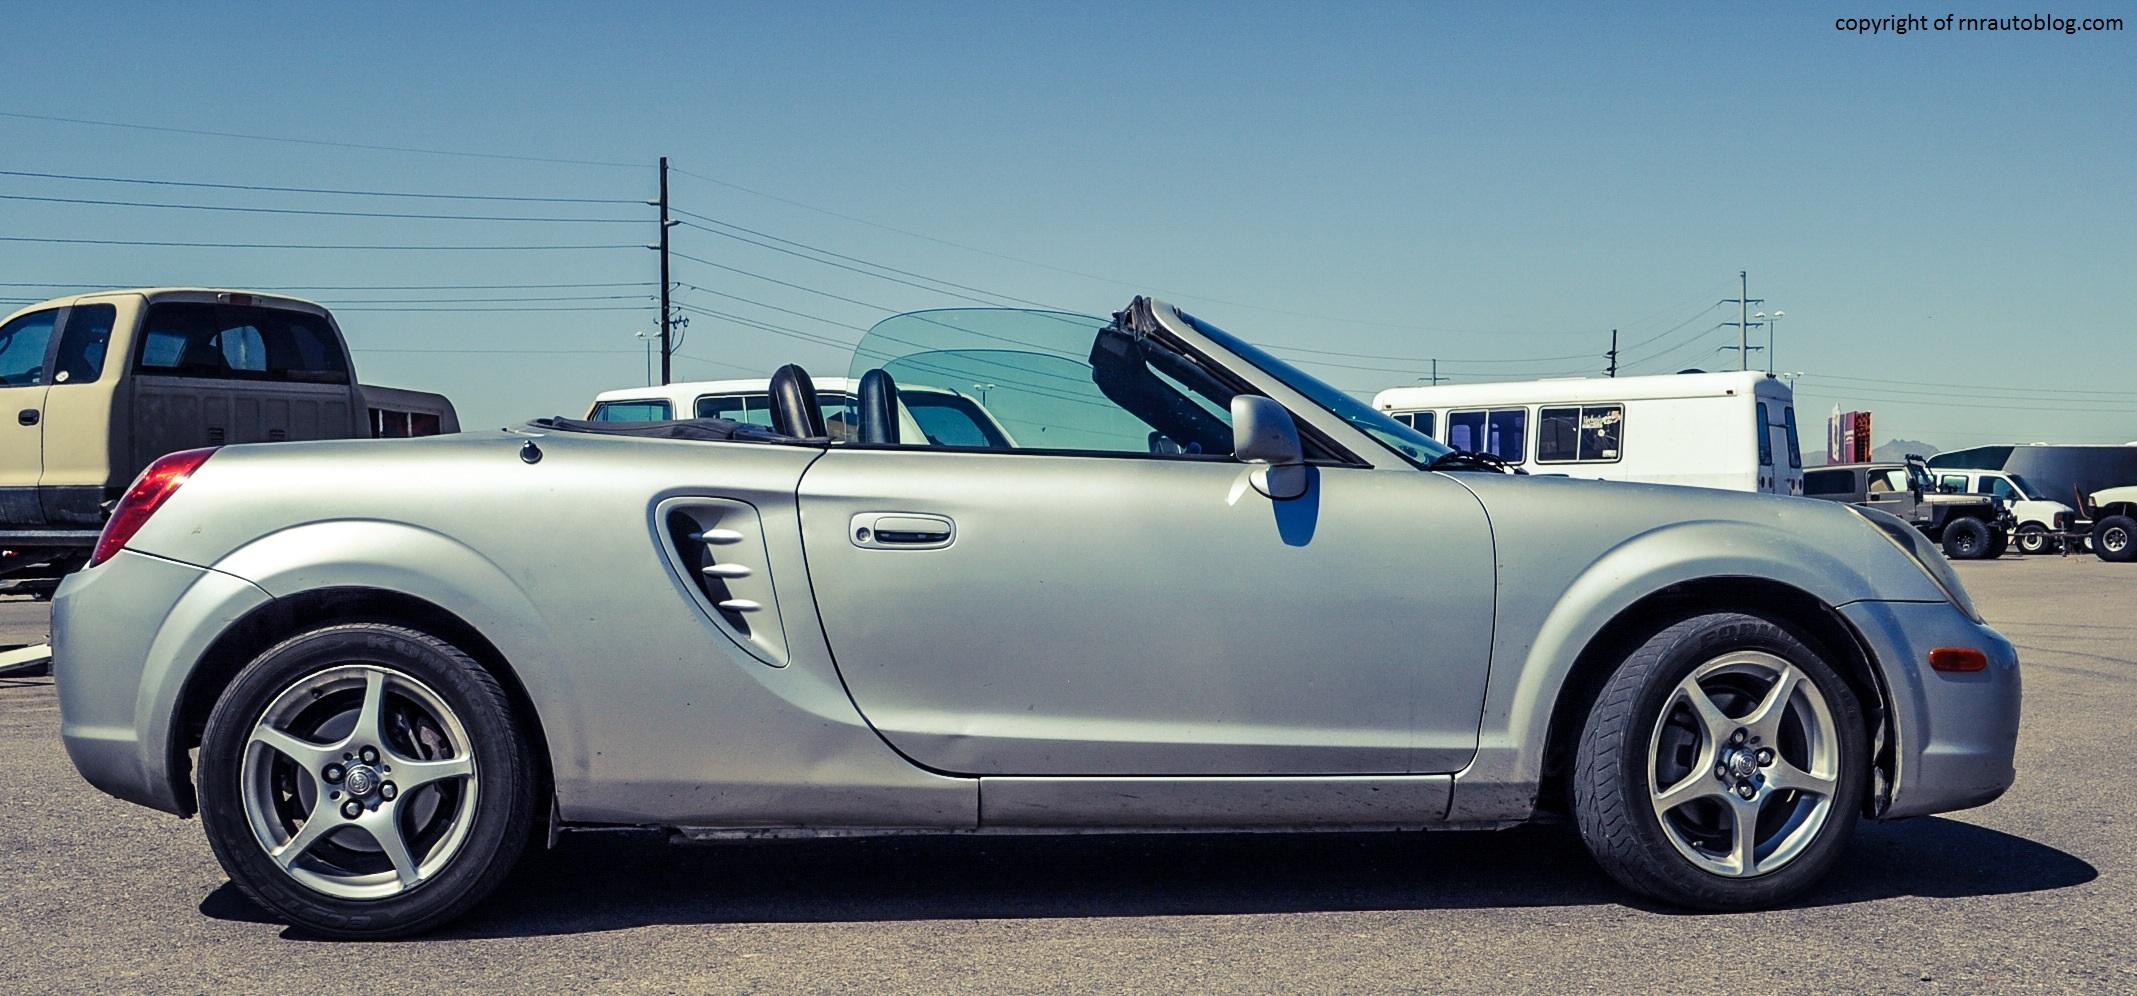 2003 toyota mr2 spyder review rnr automotive blog MR2 Spyder Review mr2 12 mr2 13